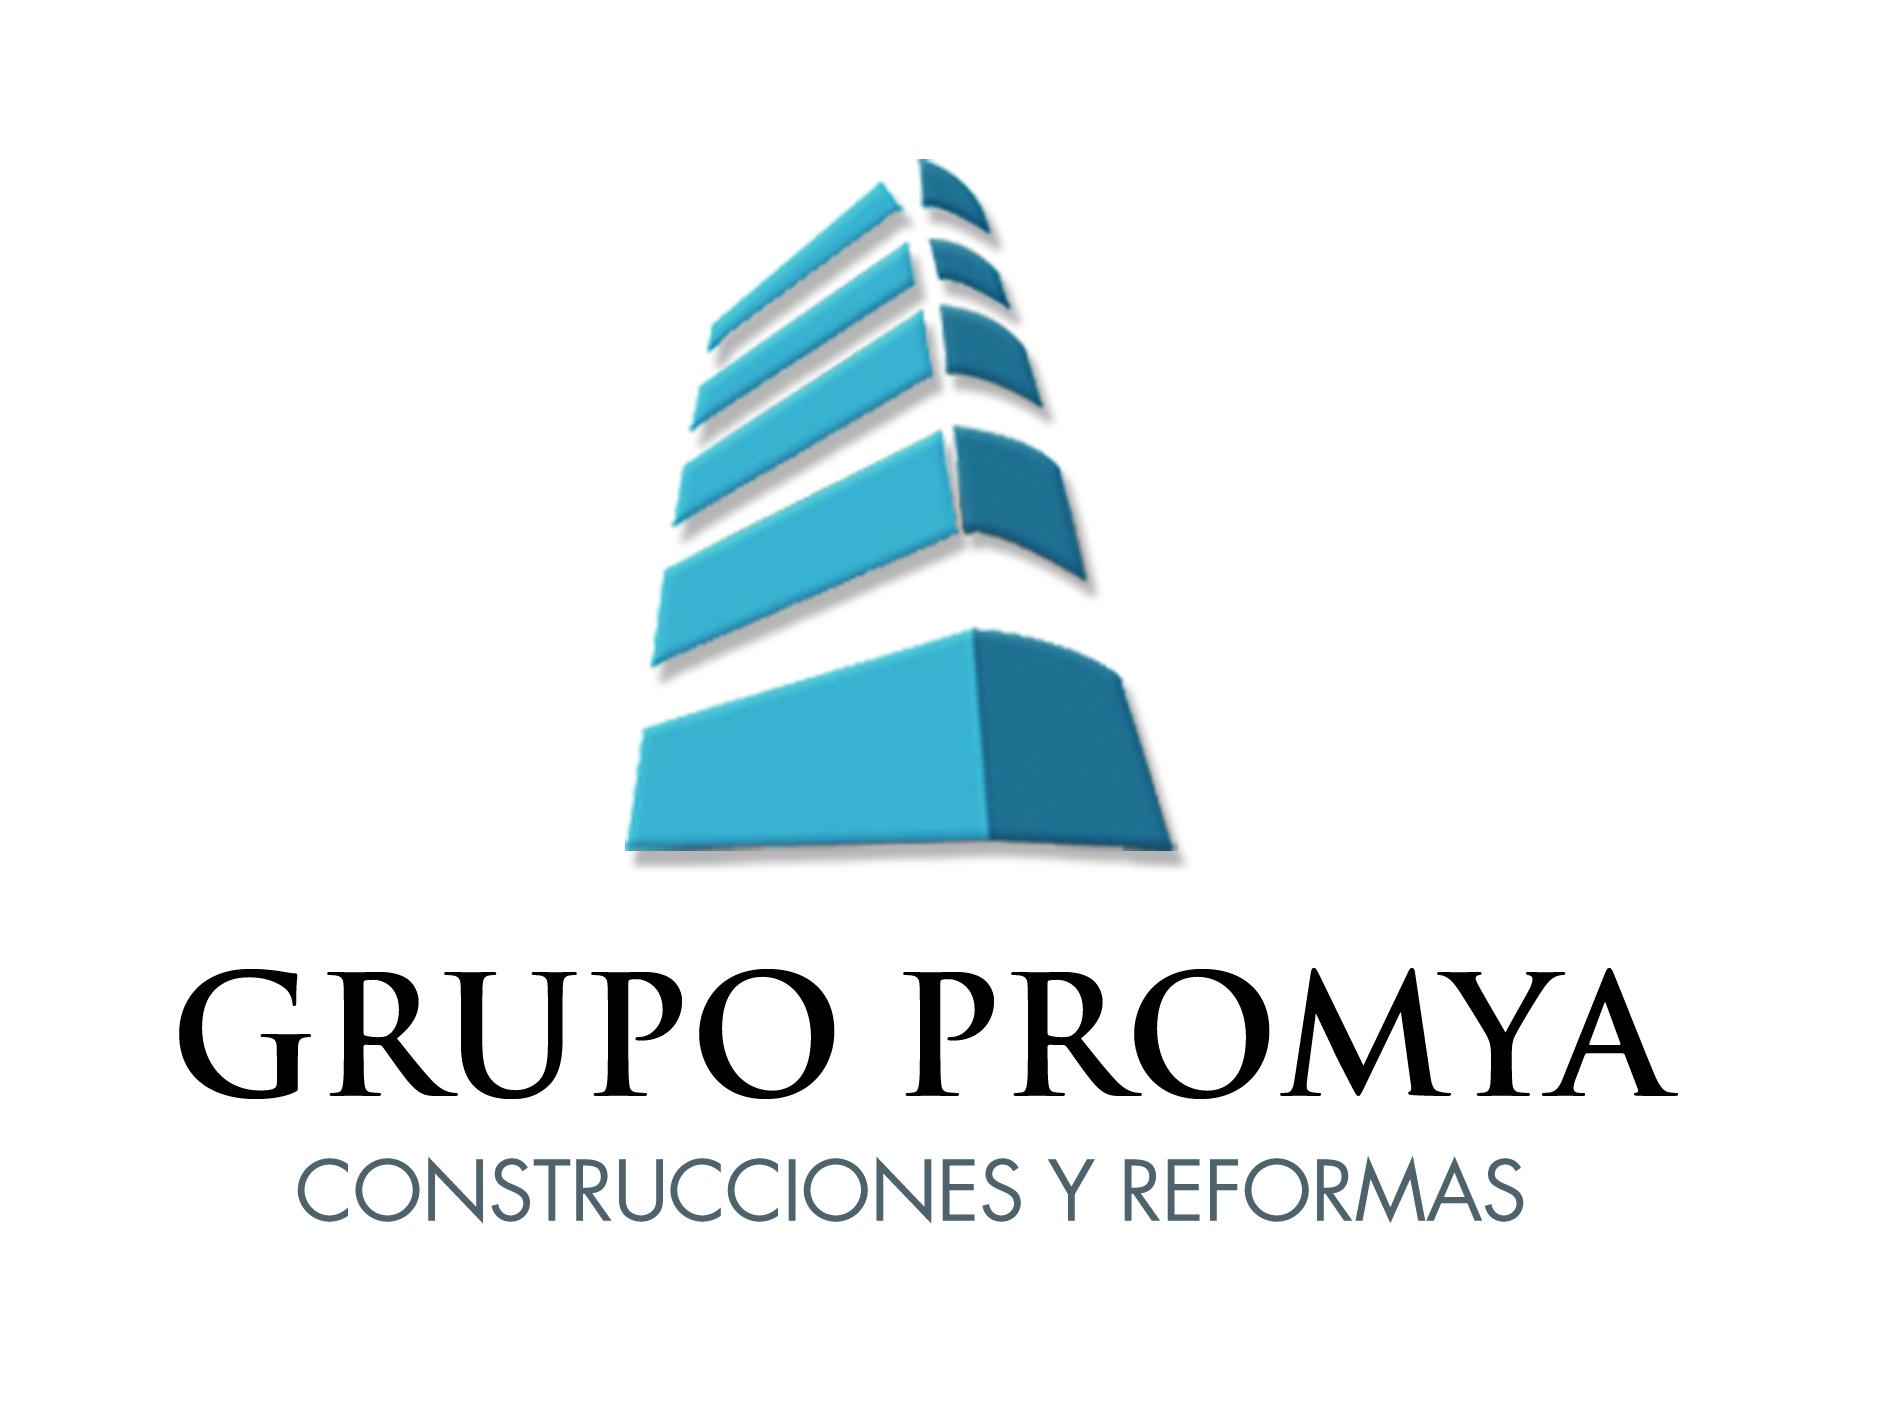 Grupo Promya